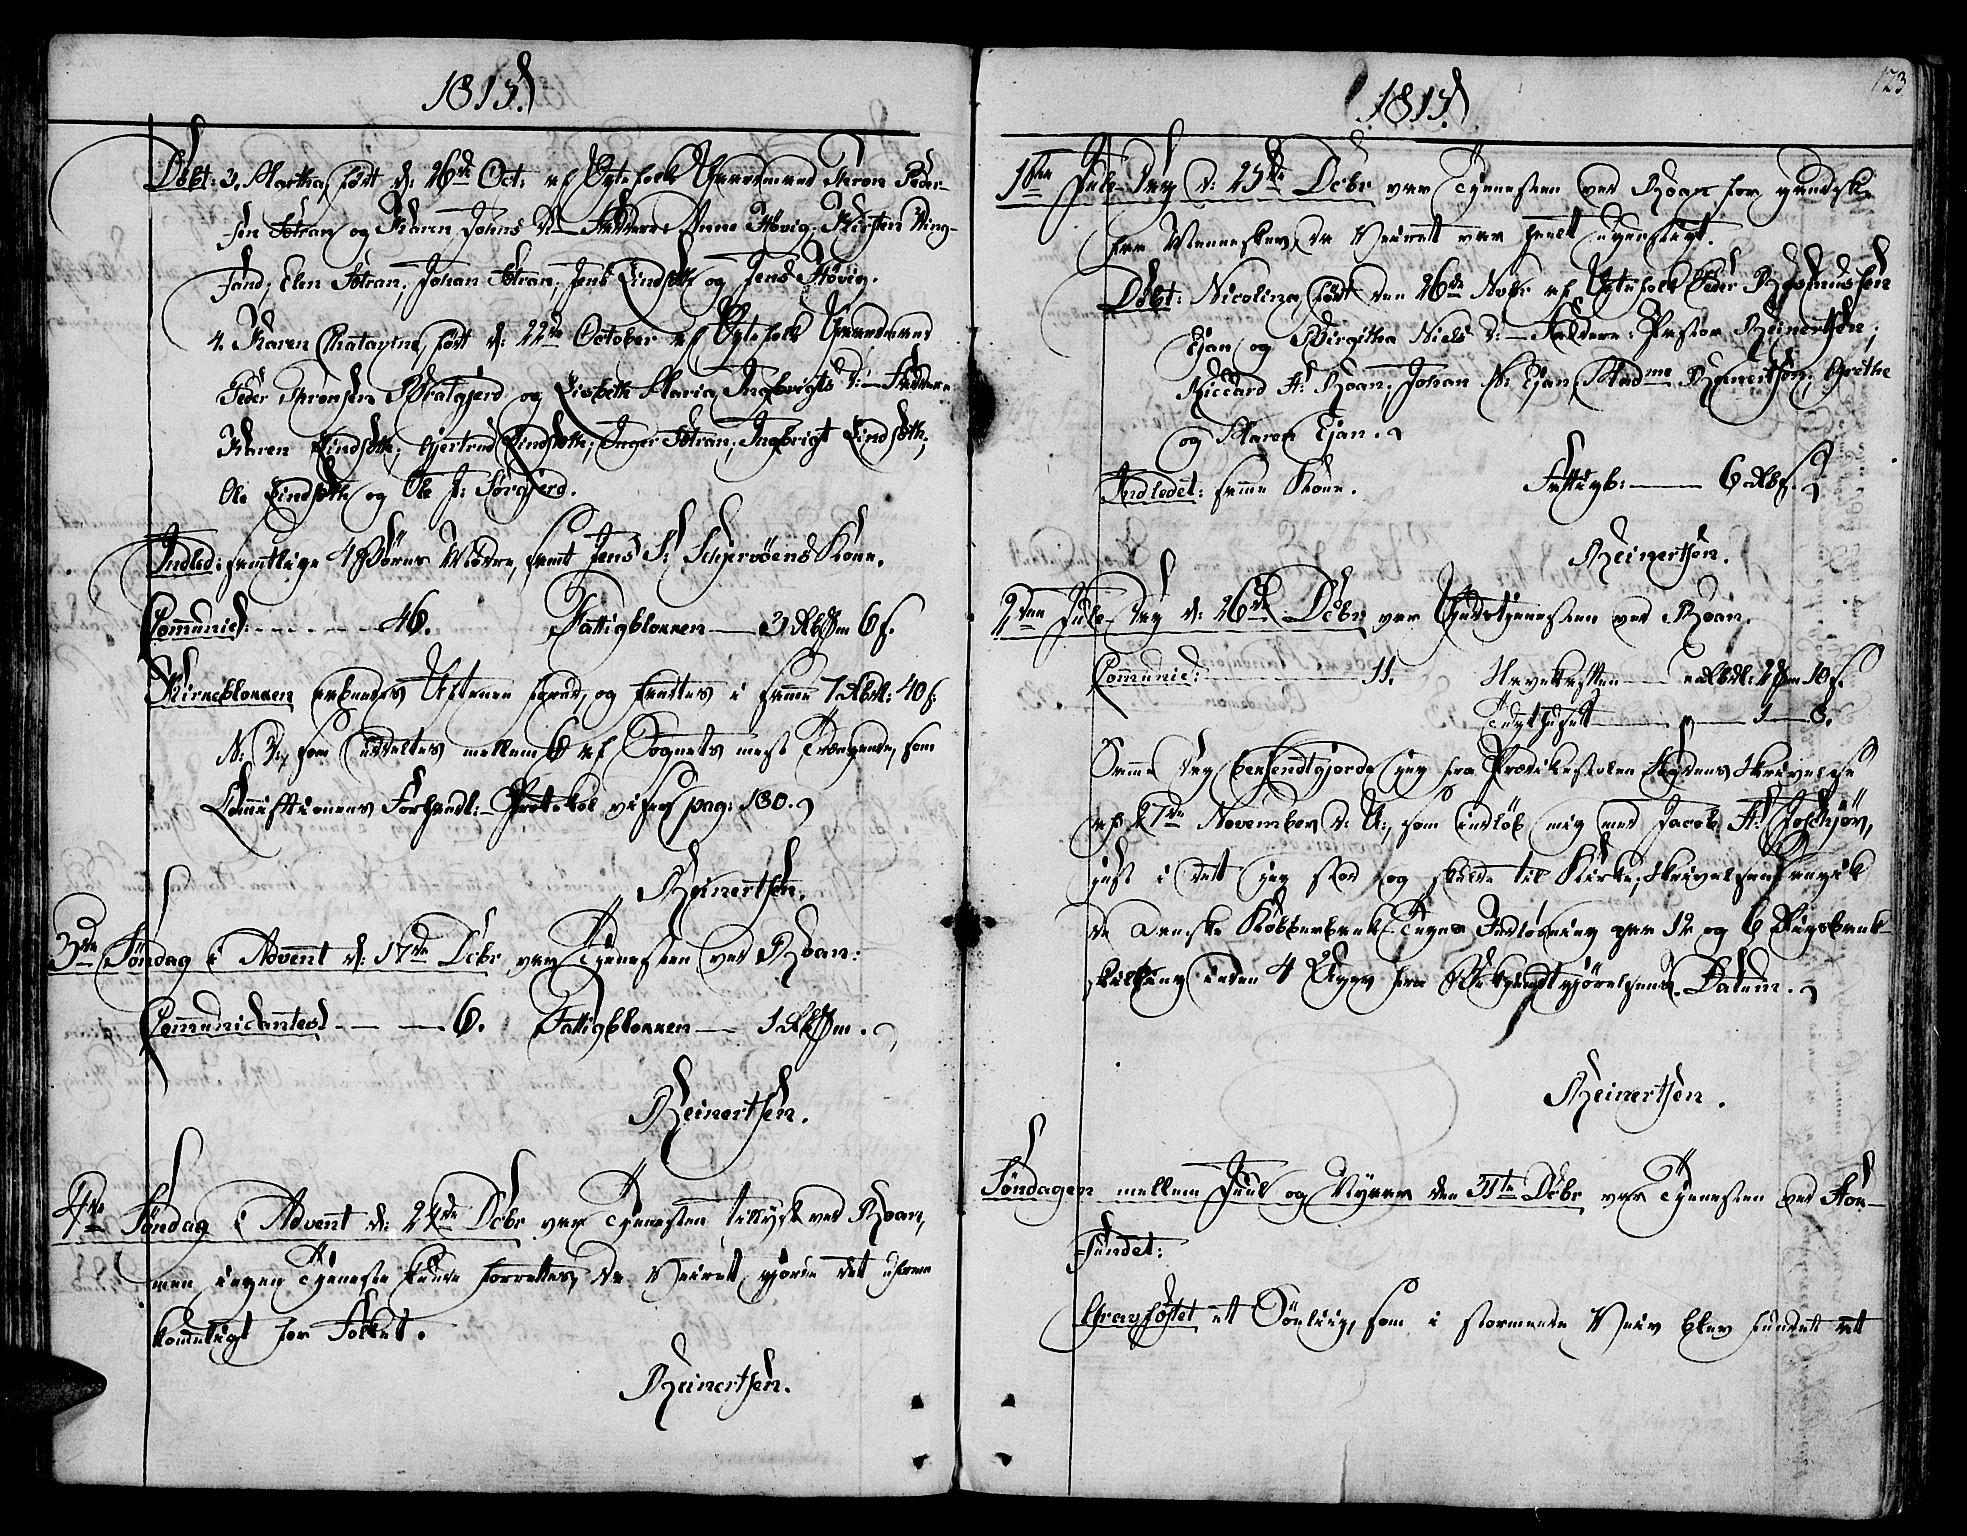 SAT, Ministerialprotokoller, klokkerbøker og fødselsregistre - Sør-Trøndelag, 657/L0701: Parish register (official) no. 657A02, 1802-1831, p. 123